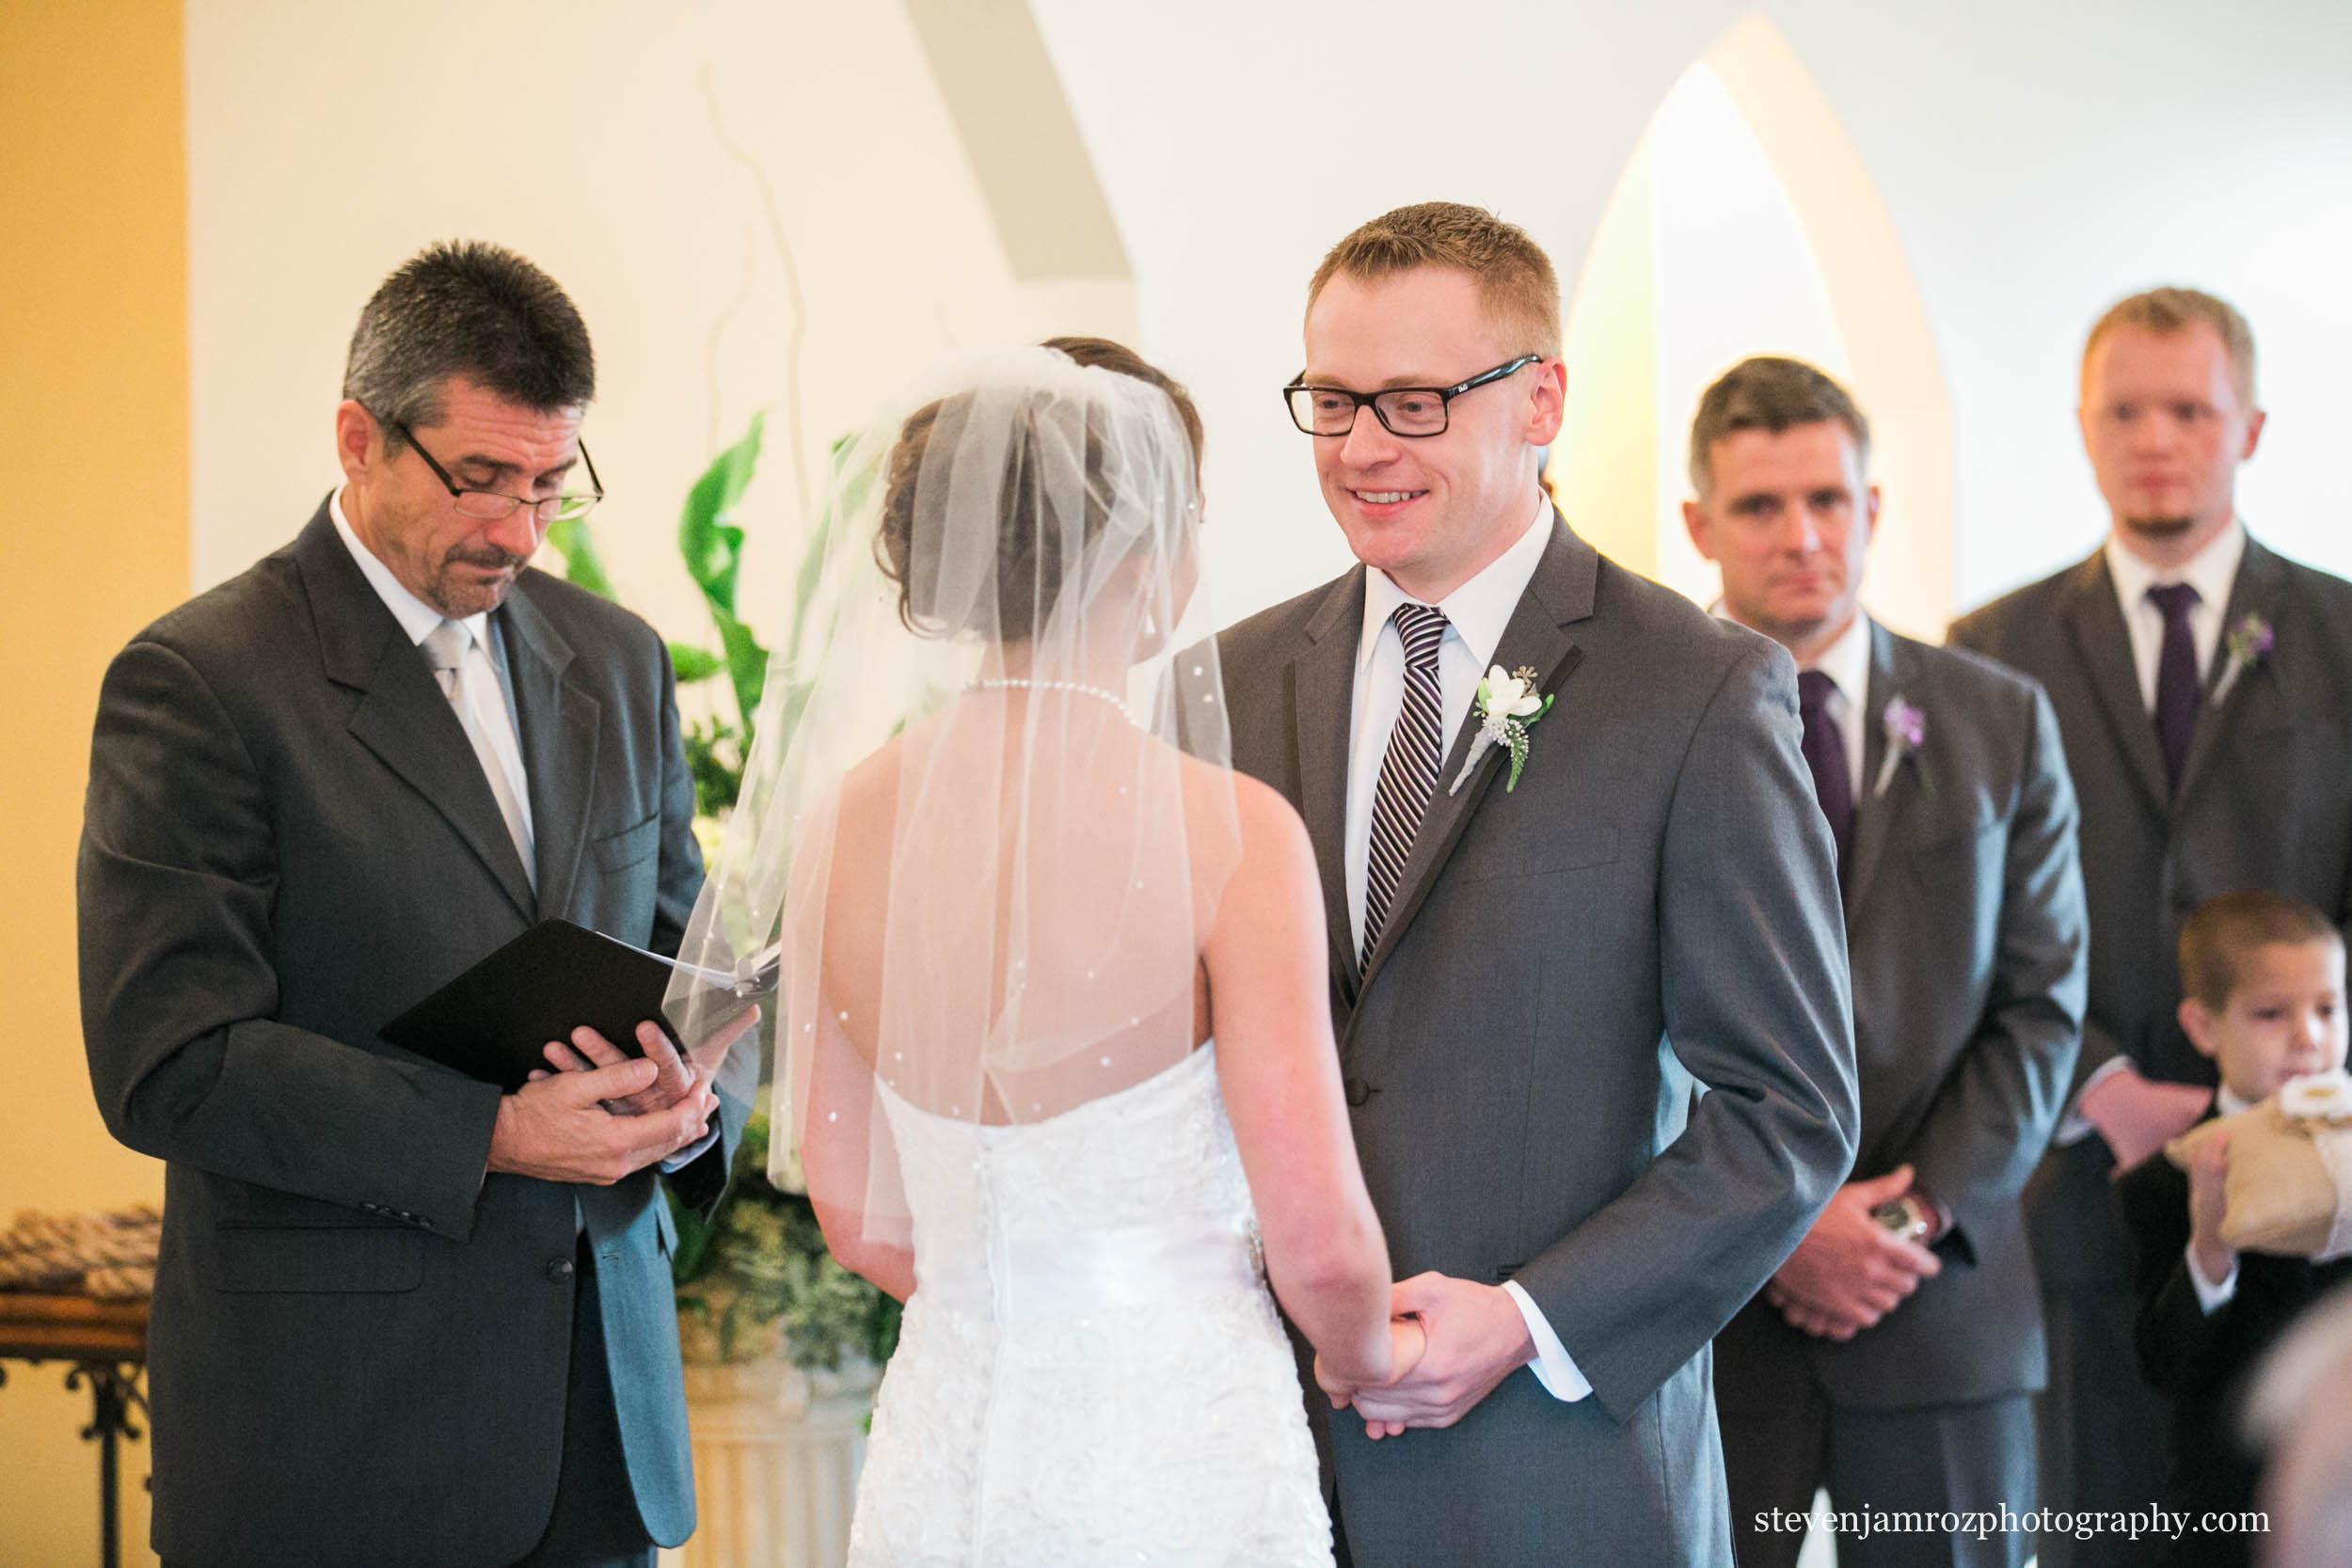 chapel-wedding-hudson-manor-estate-steven-jamroz-photography-0380.jpg